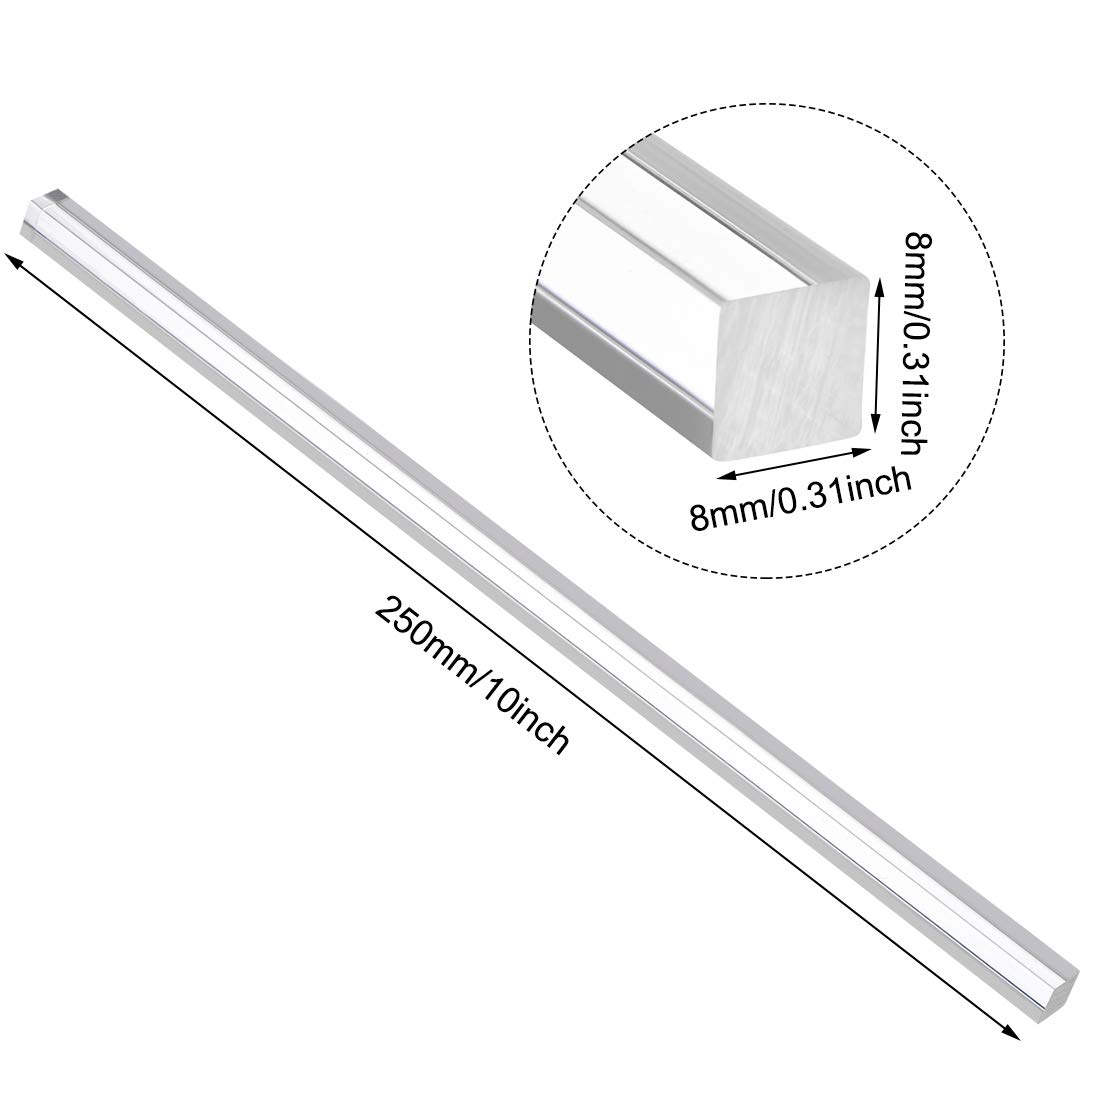 sourcing map 8mmx8mmx250mm Trasparente acrilico solido asta quadra PMMA barra 2pz.